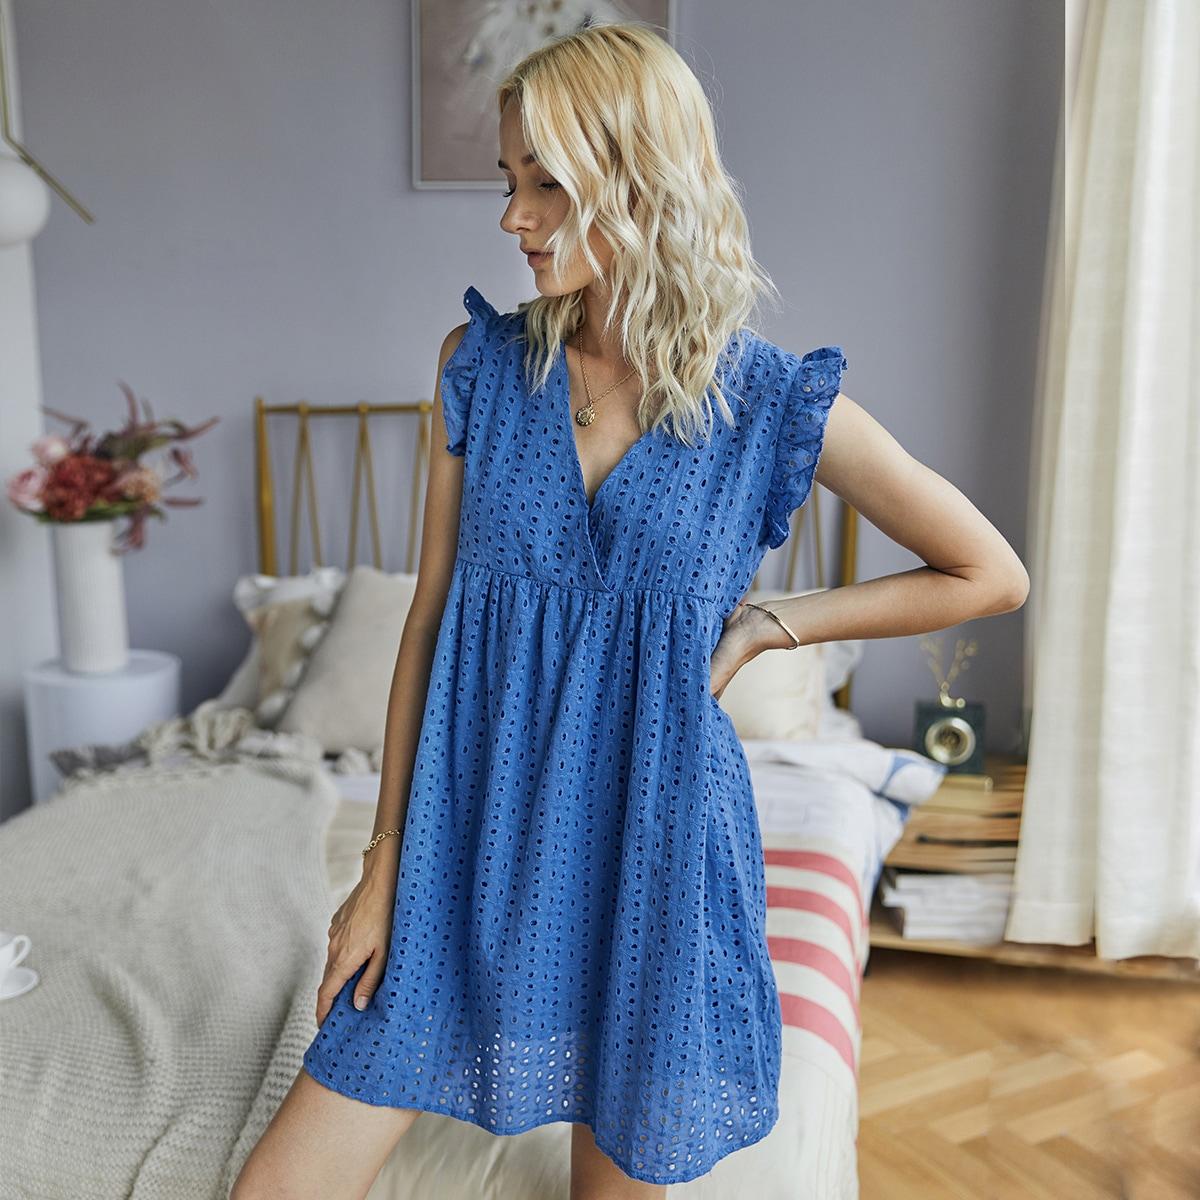 SHEIN / Eyelet Embroidery Ruffle Babydoll Dress